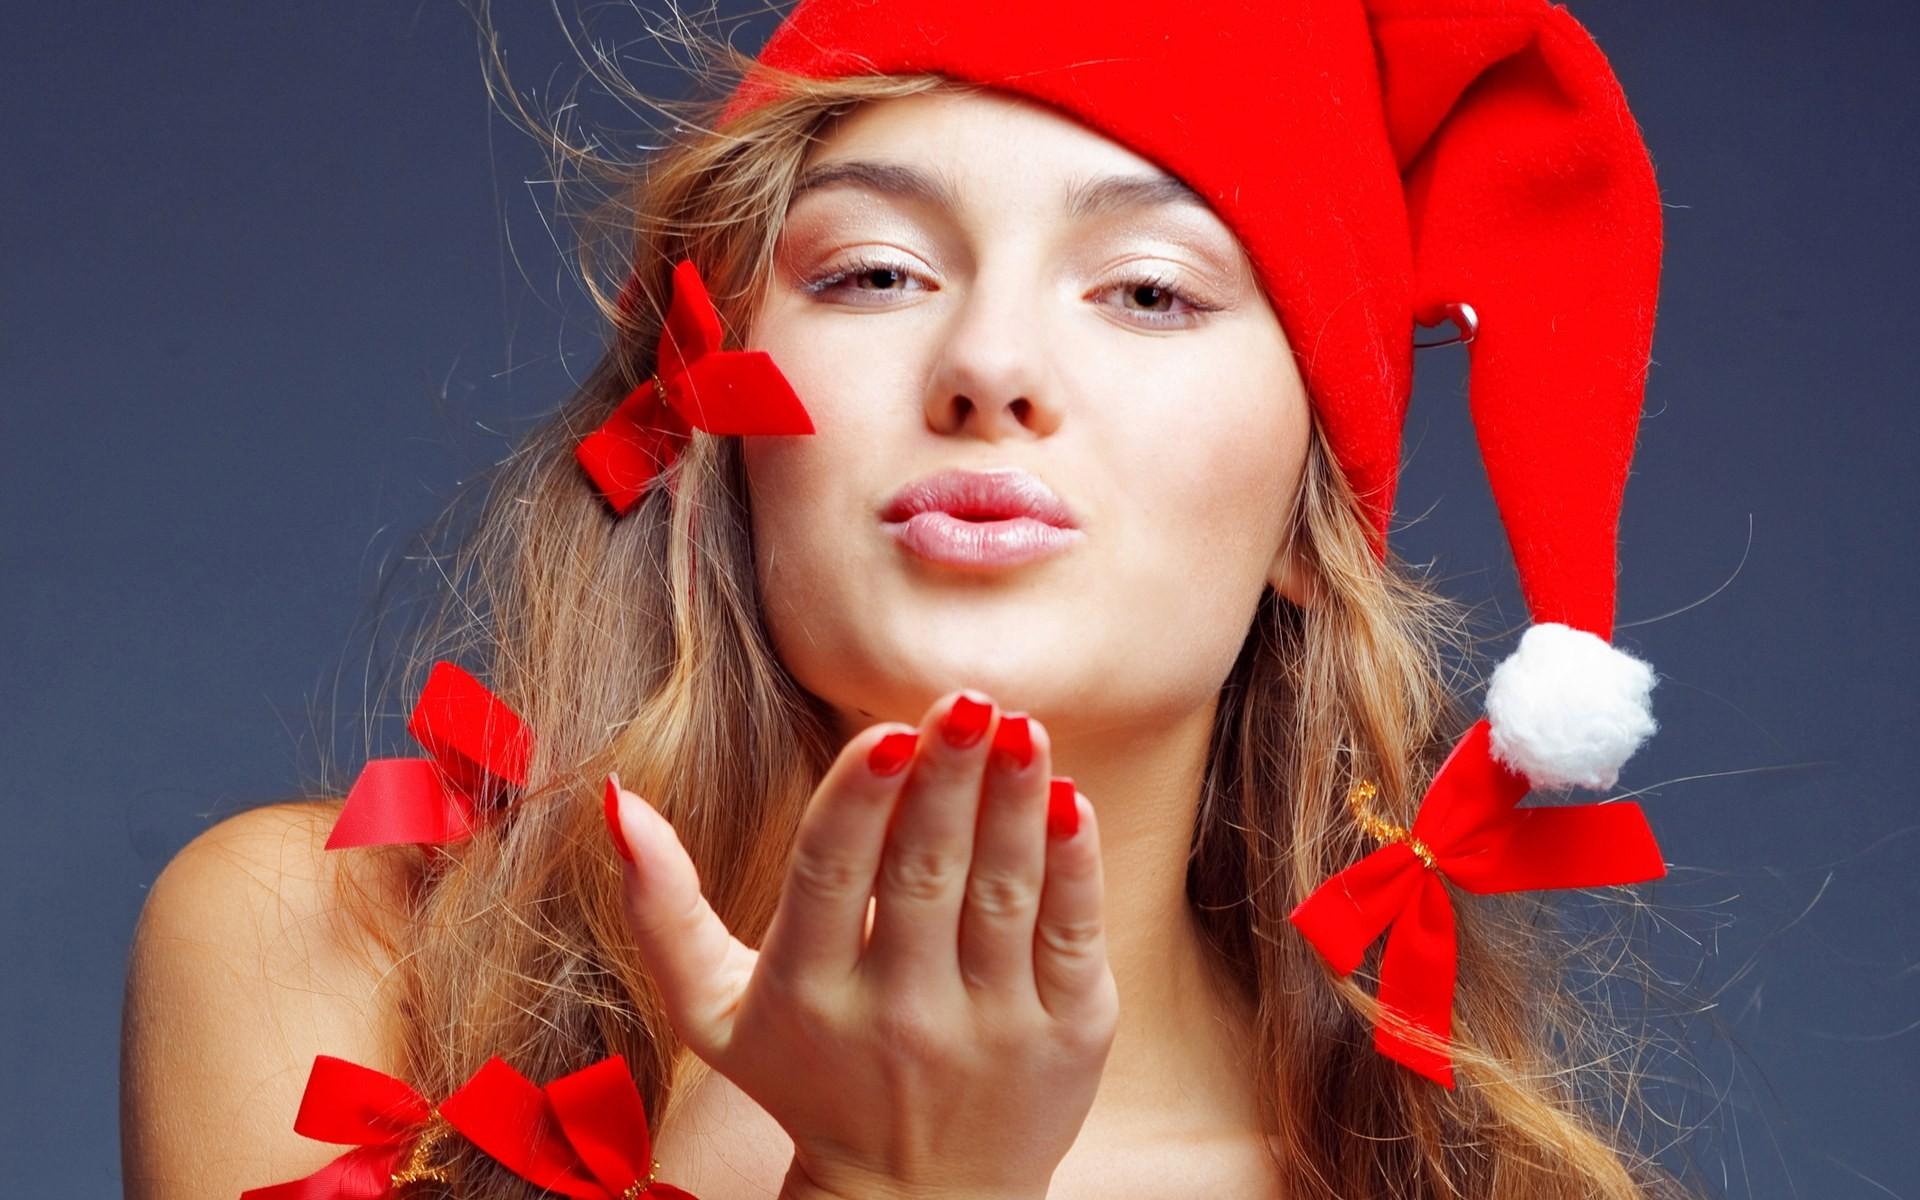 Chica disfraz de Santa Claus - 1920x1200